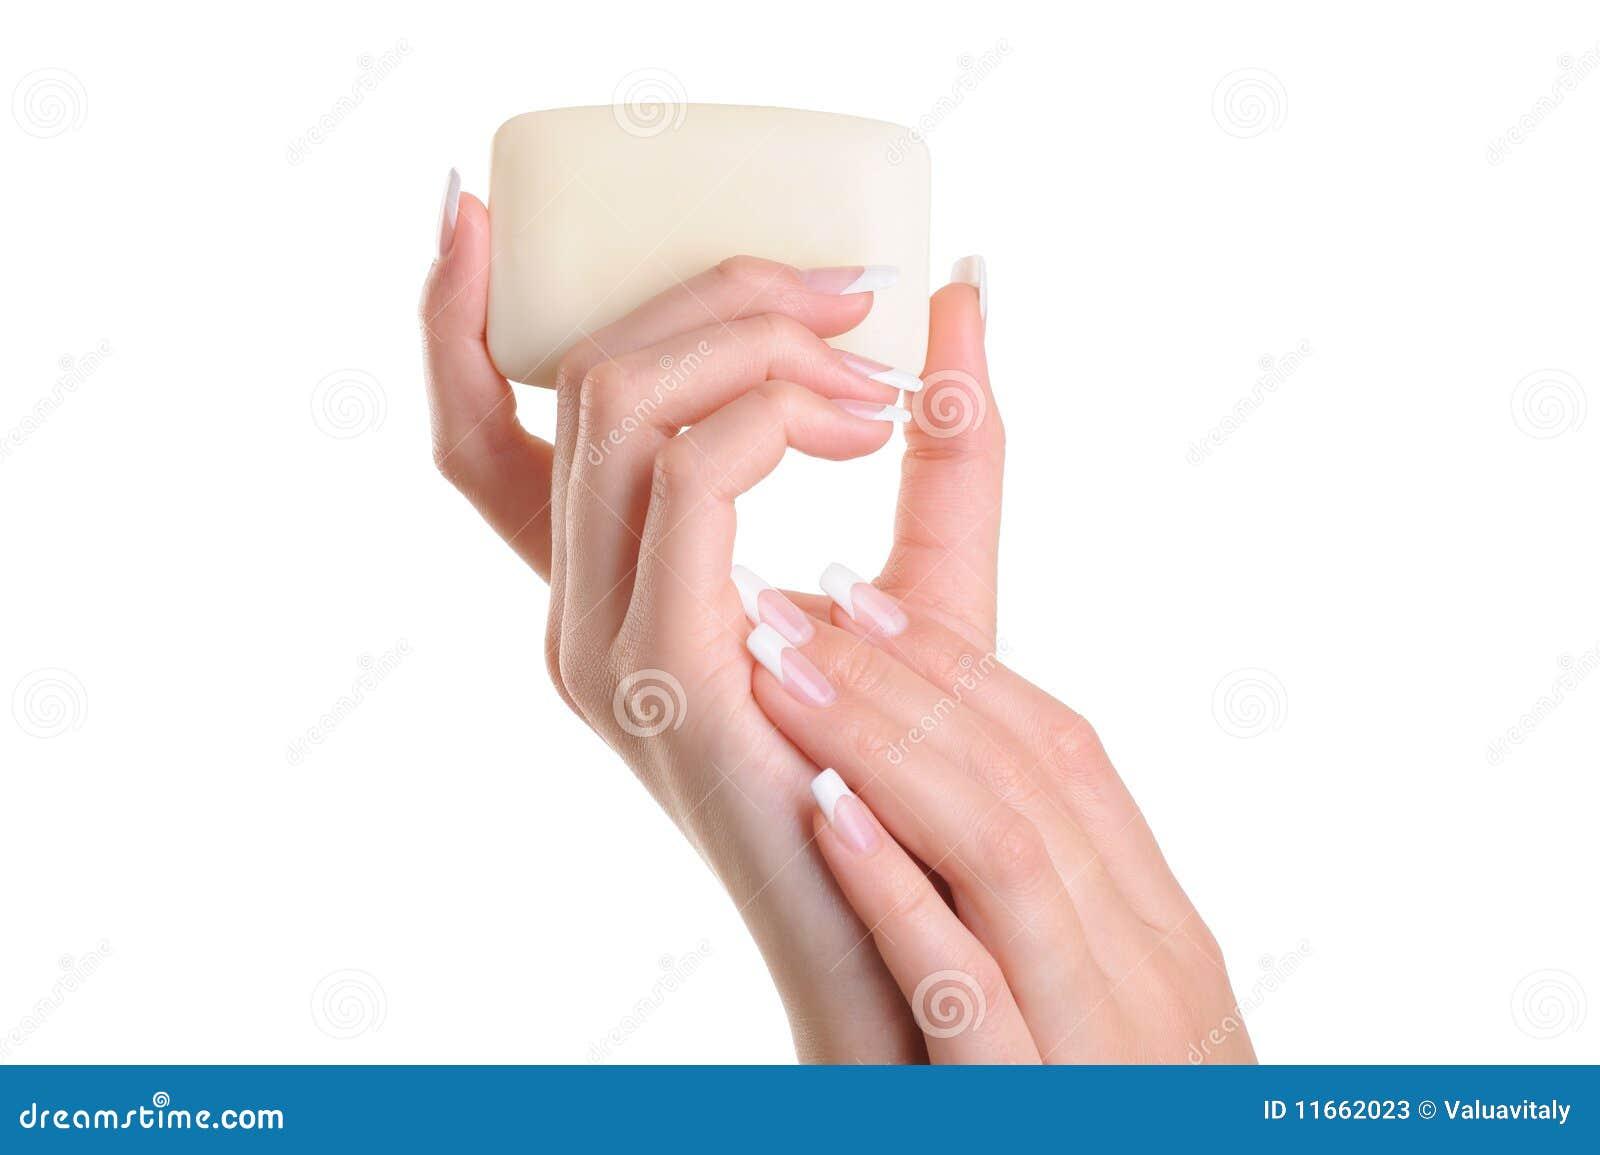 Beauty Women Hand Holding The White Soap Stock Photos